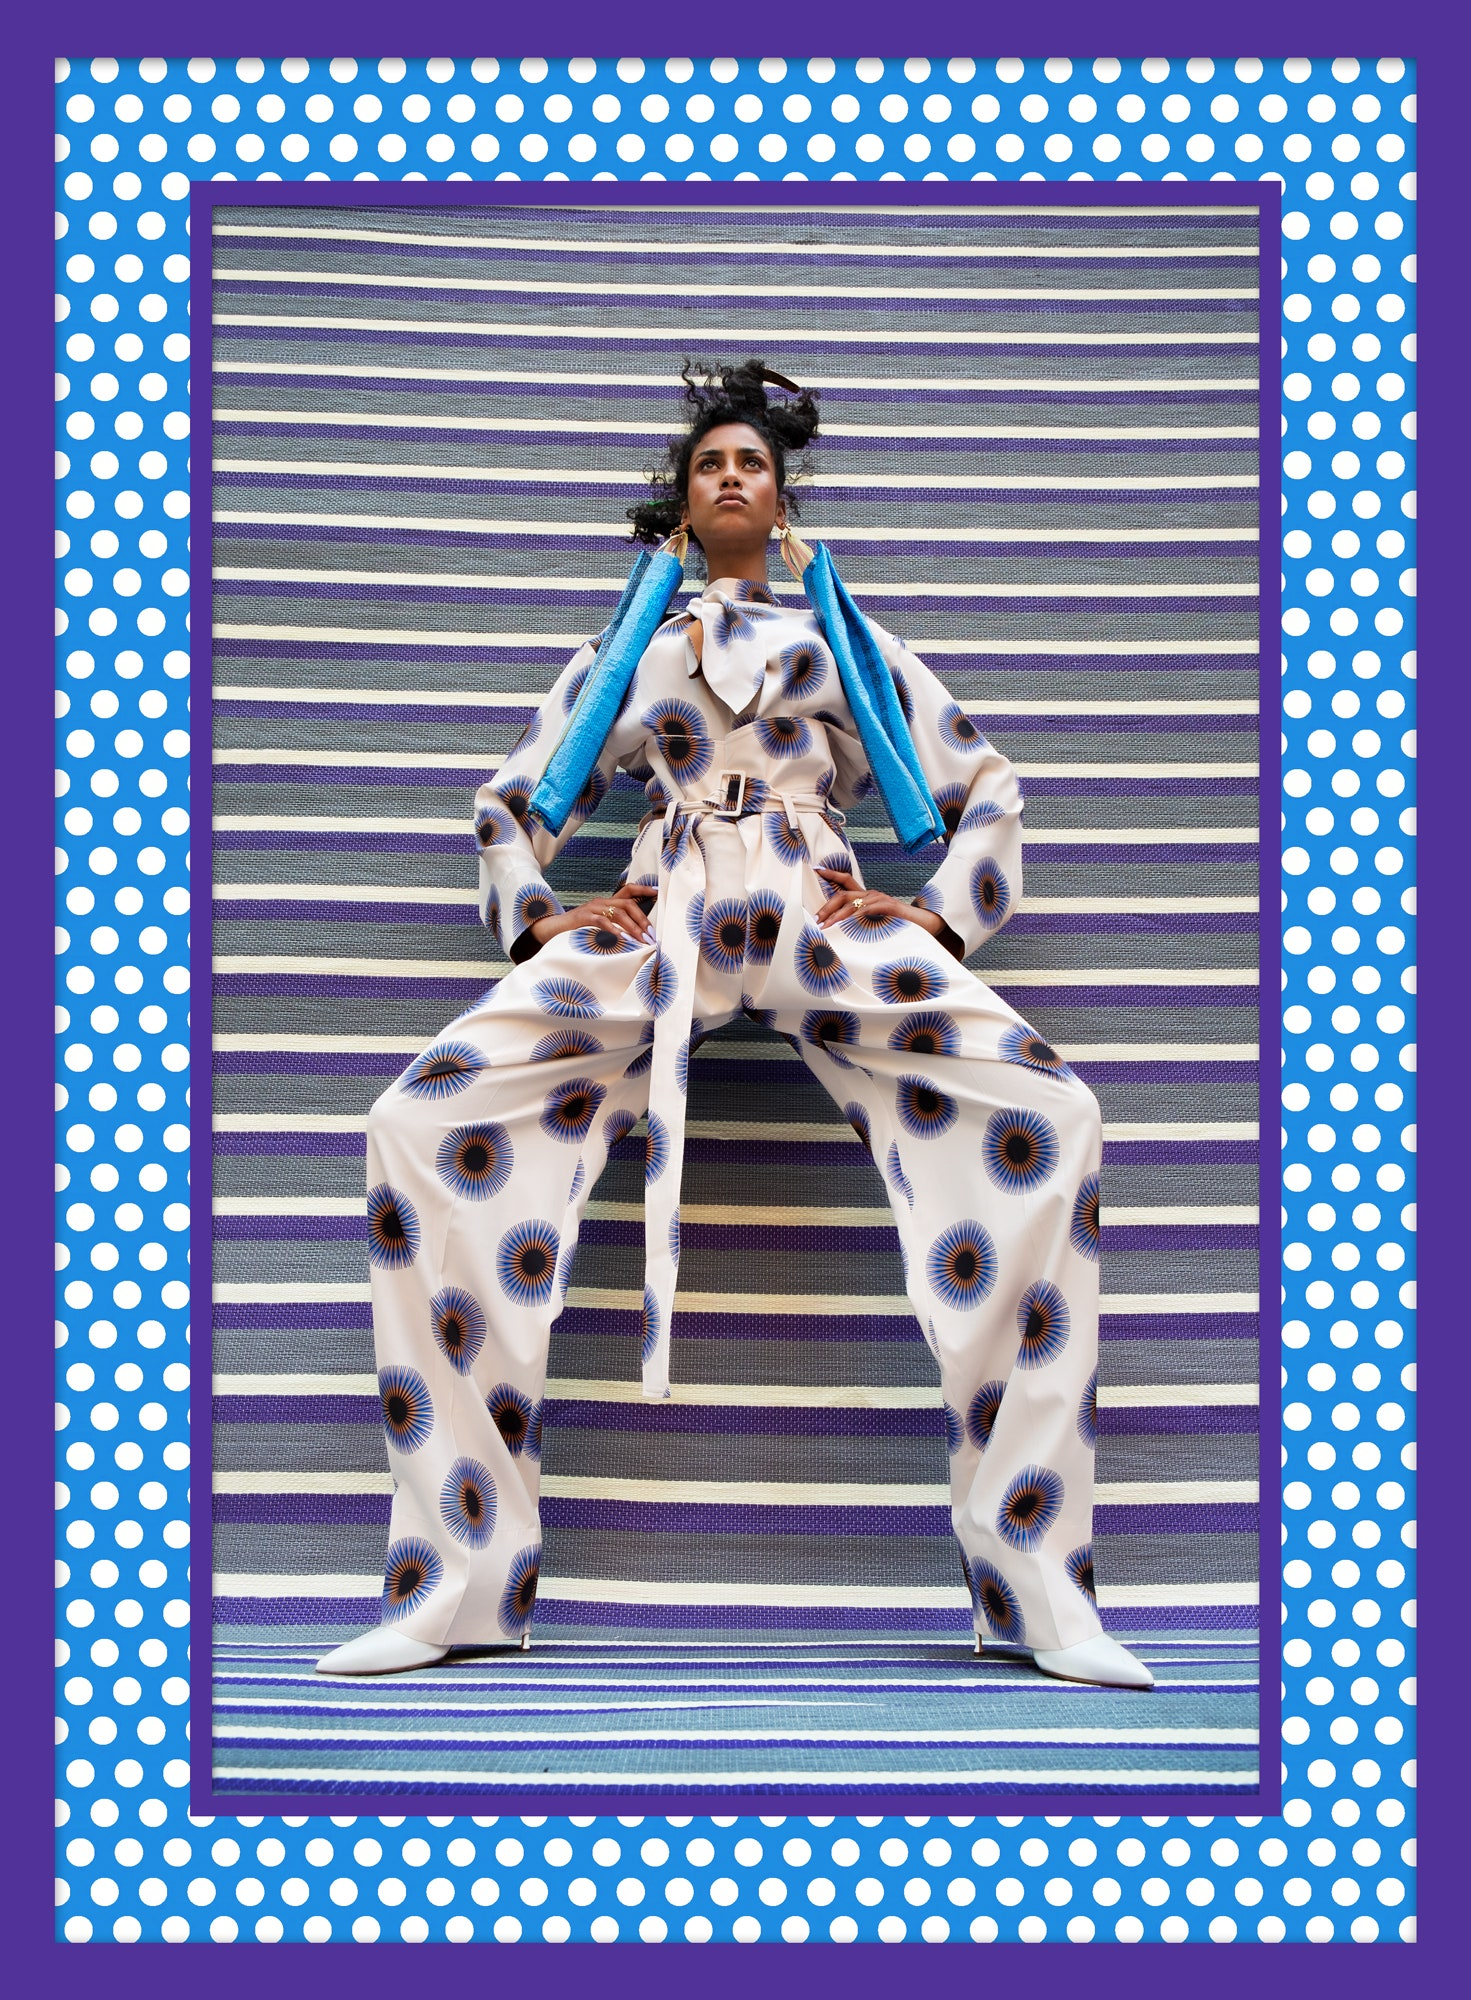 Imaan Hammam by Hassan Hajjaj for Vanity Fair October 2020